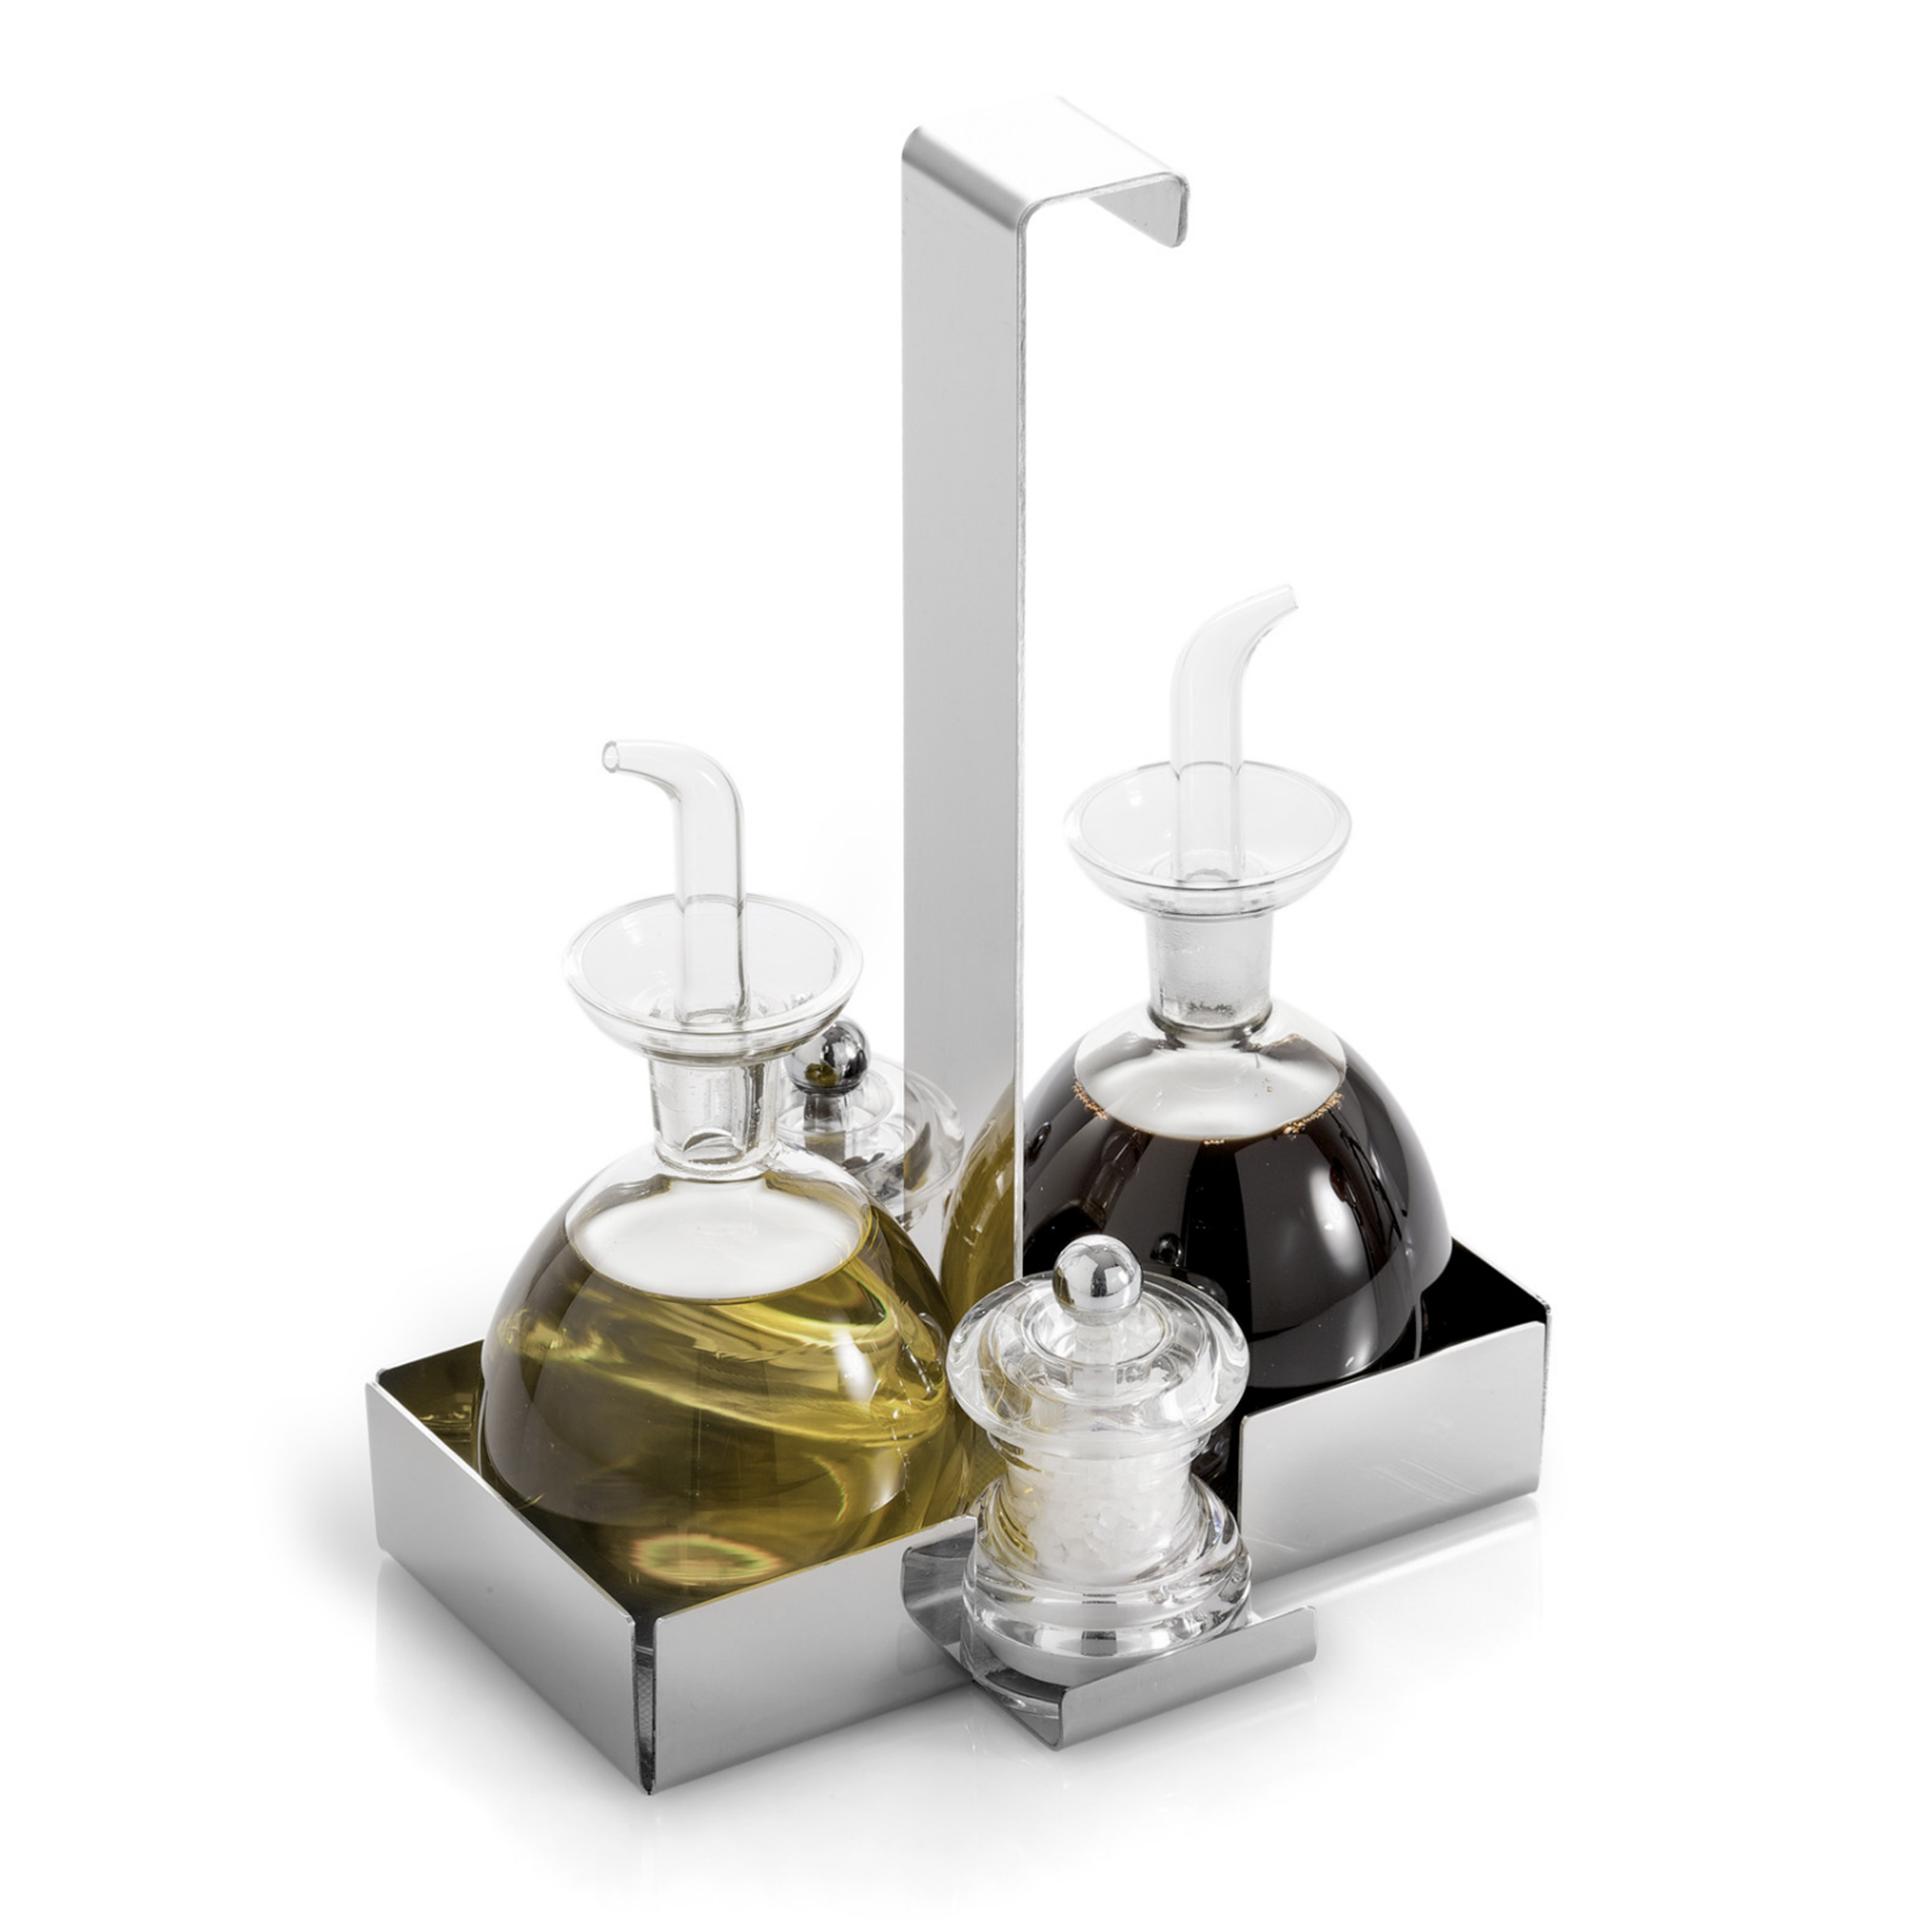 Superb Stainless Steel Oil And Vinegar Condiment Holder Caddy Set With Bottle  Dispenser Cruets And Salt And Pepper Grinder Shakers Elleffe Design